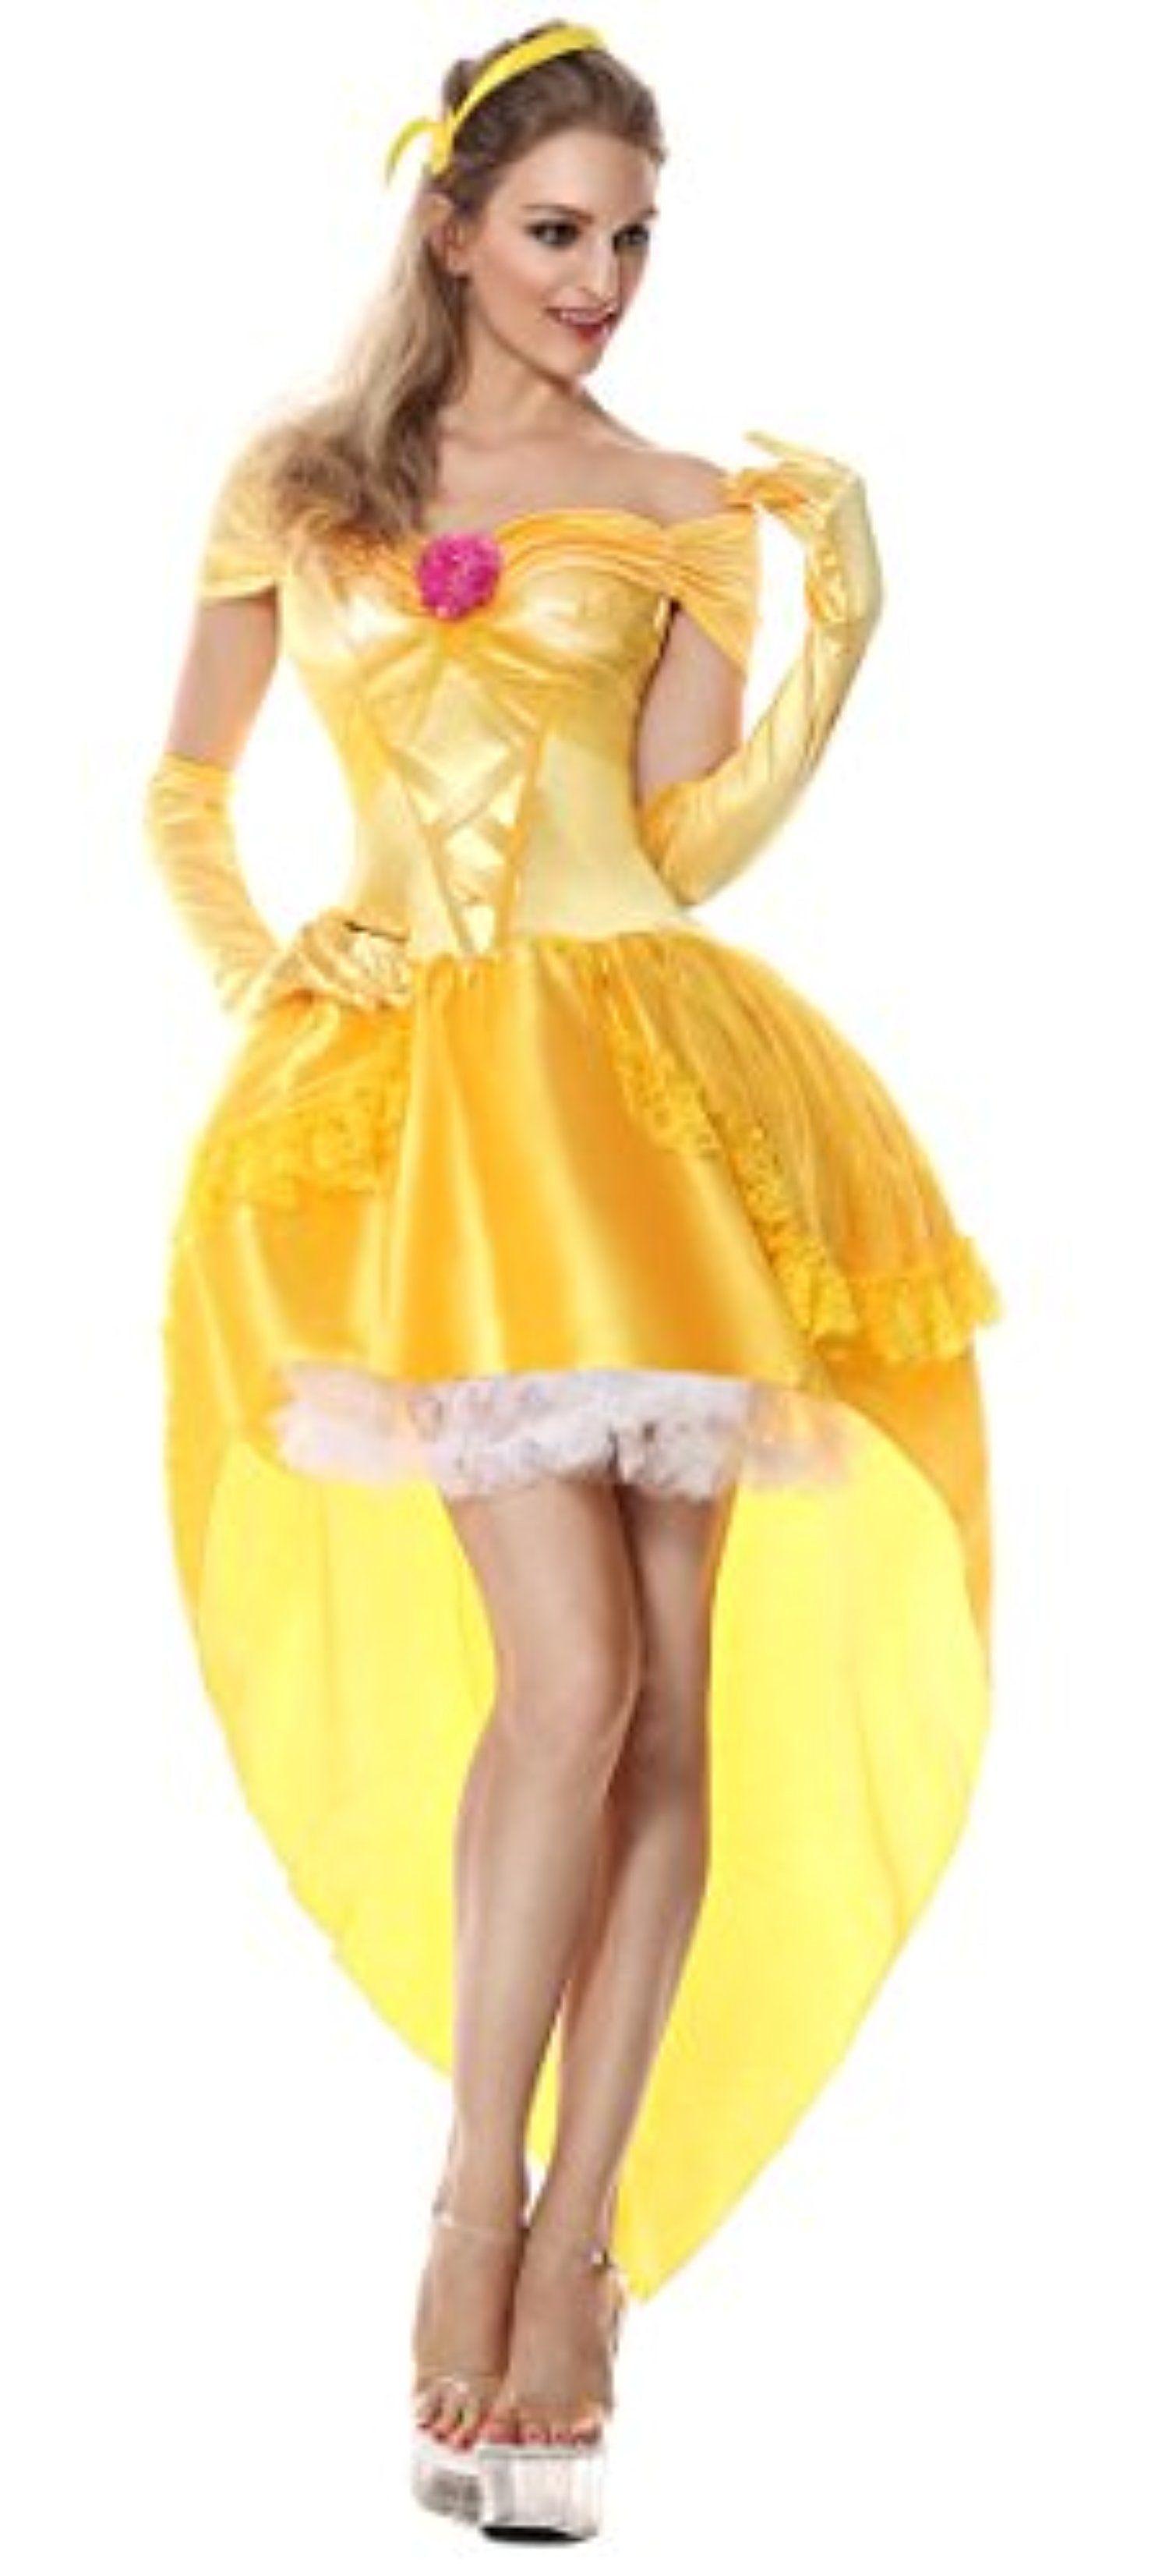 killreal women's enchanting princess belle storybook halloween